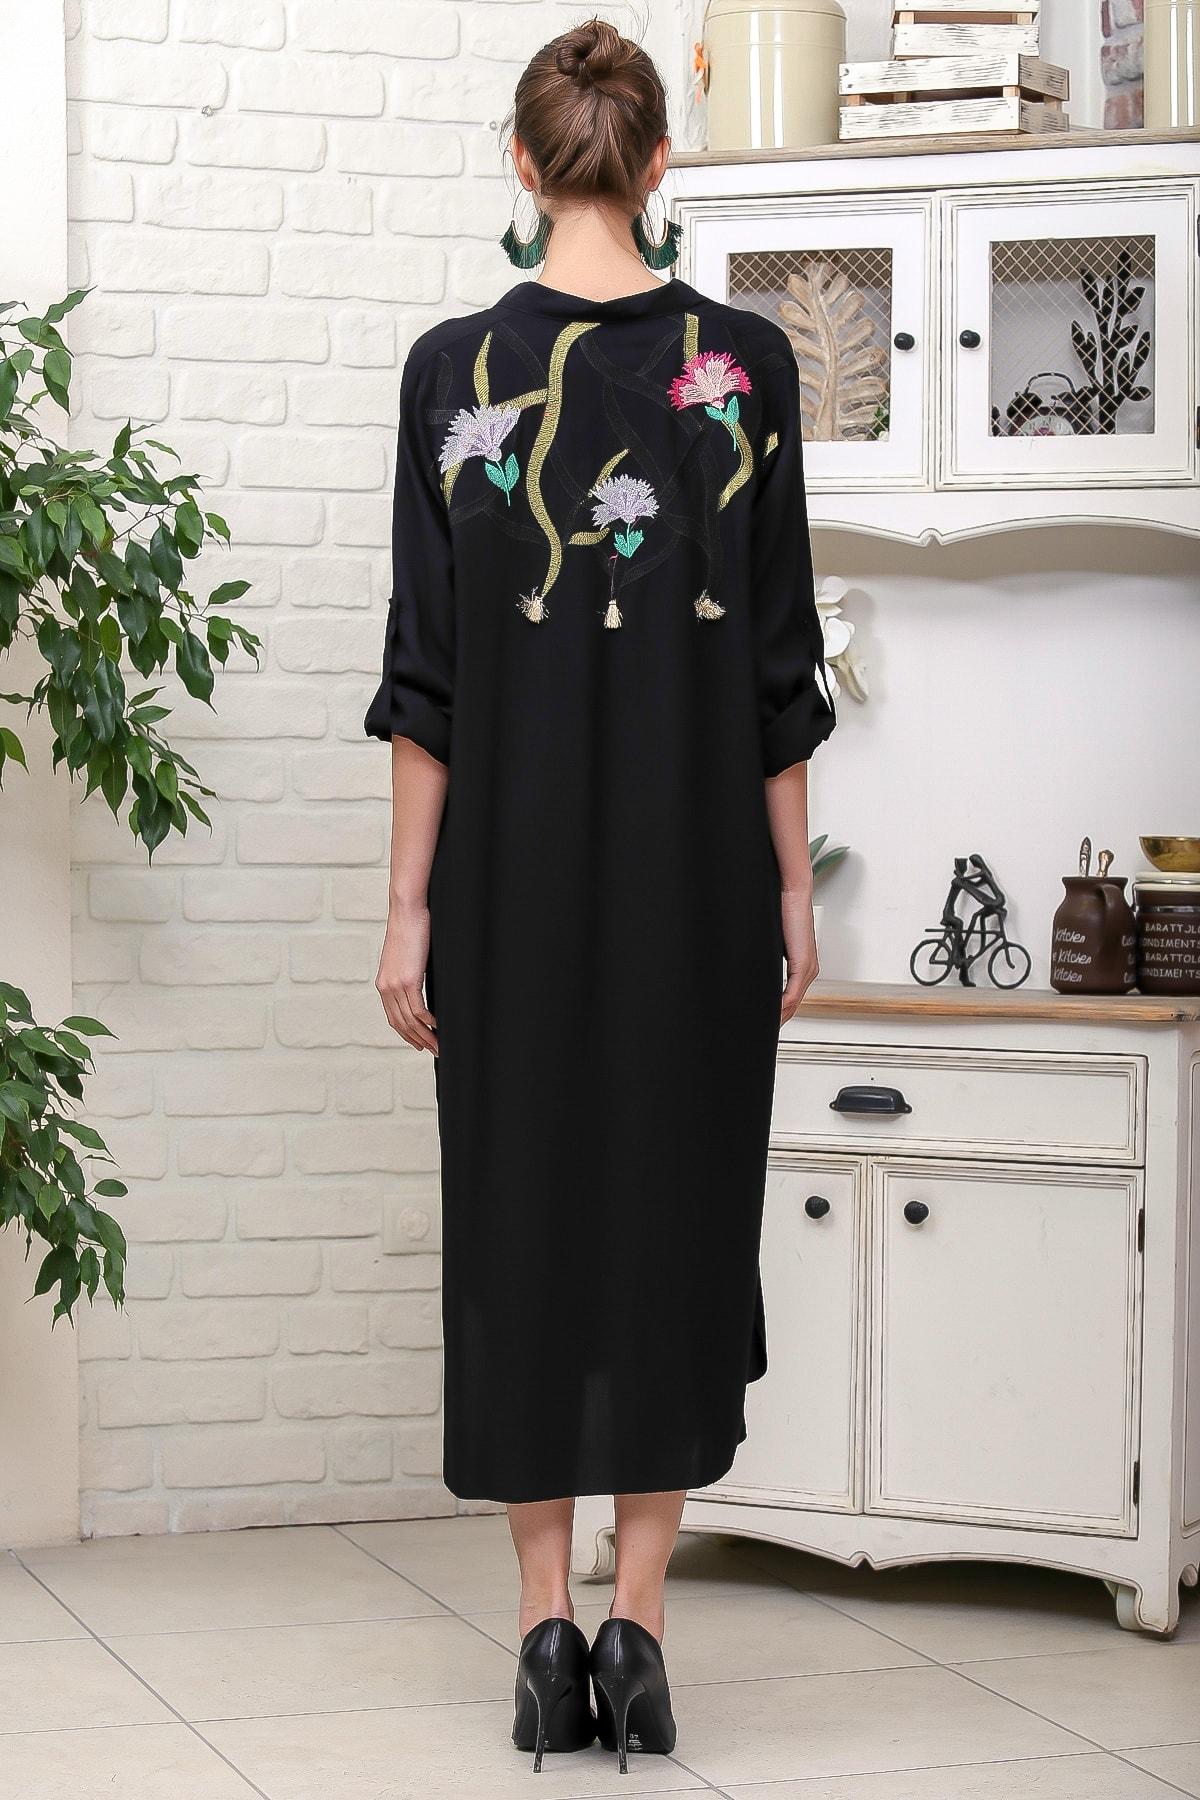 Chiccy Kadın Siyah Karanfil Nakışlı Sırt Detaylı Düğmeli Salaş Gömlek Elbise M10160000EL95923 4